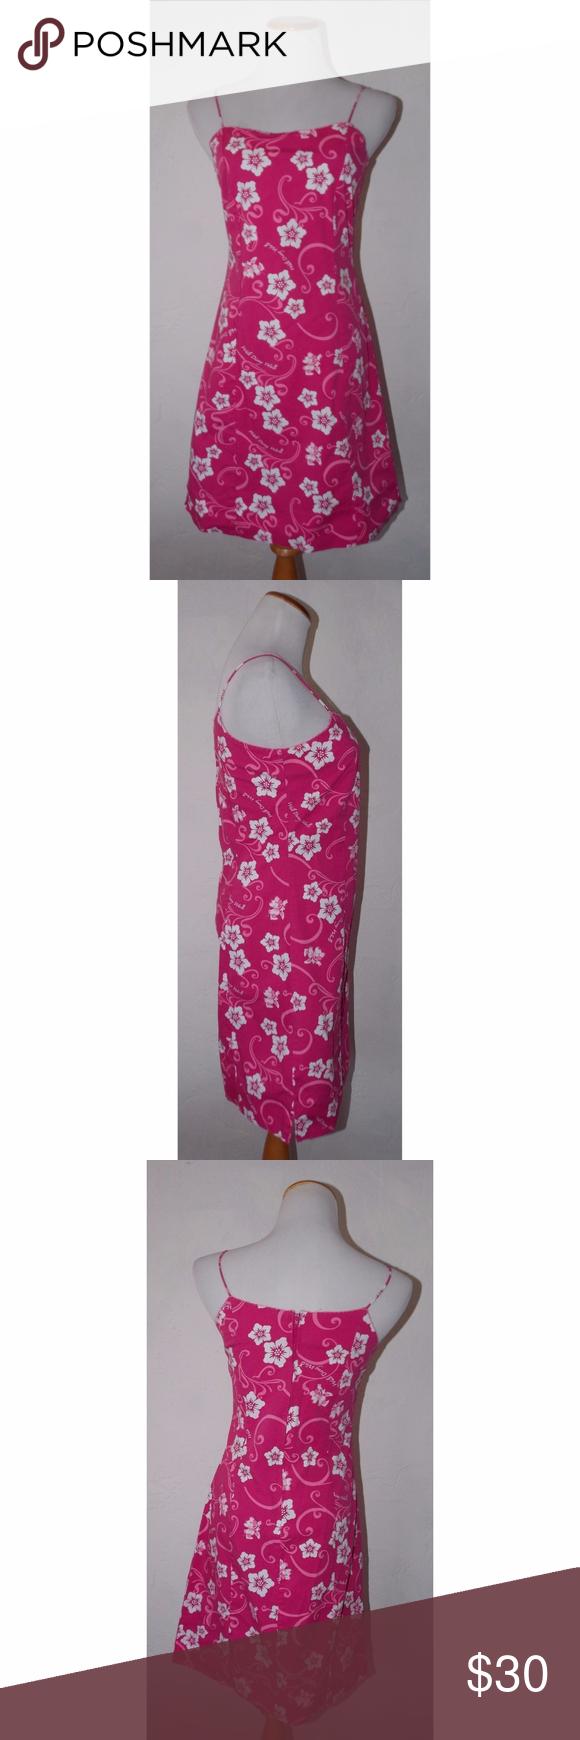 Walt disney world floral sun dress size minnie disney dresses